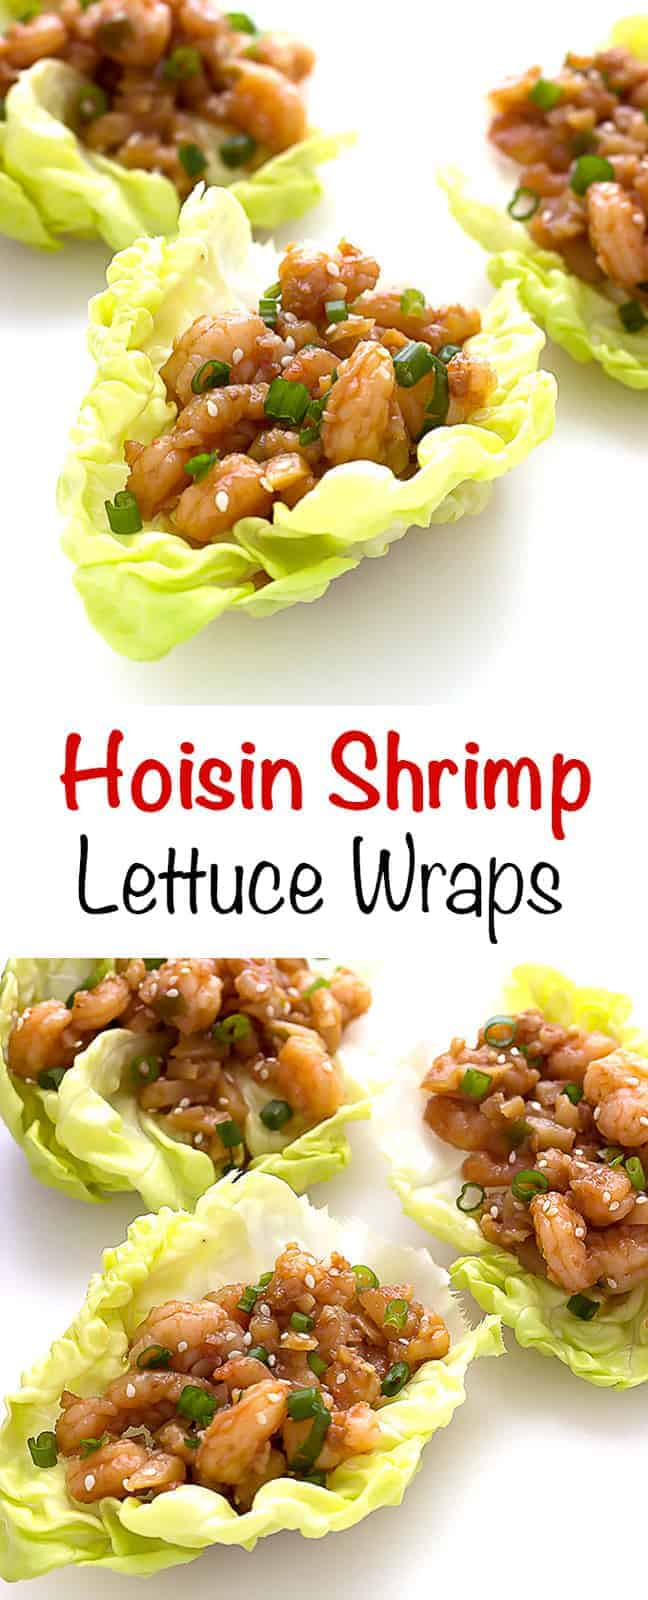 Hoisin Shrimp Lettuce Wraps - The Wholesome Dish